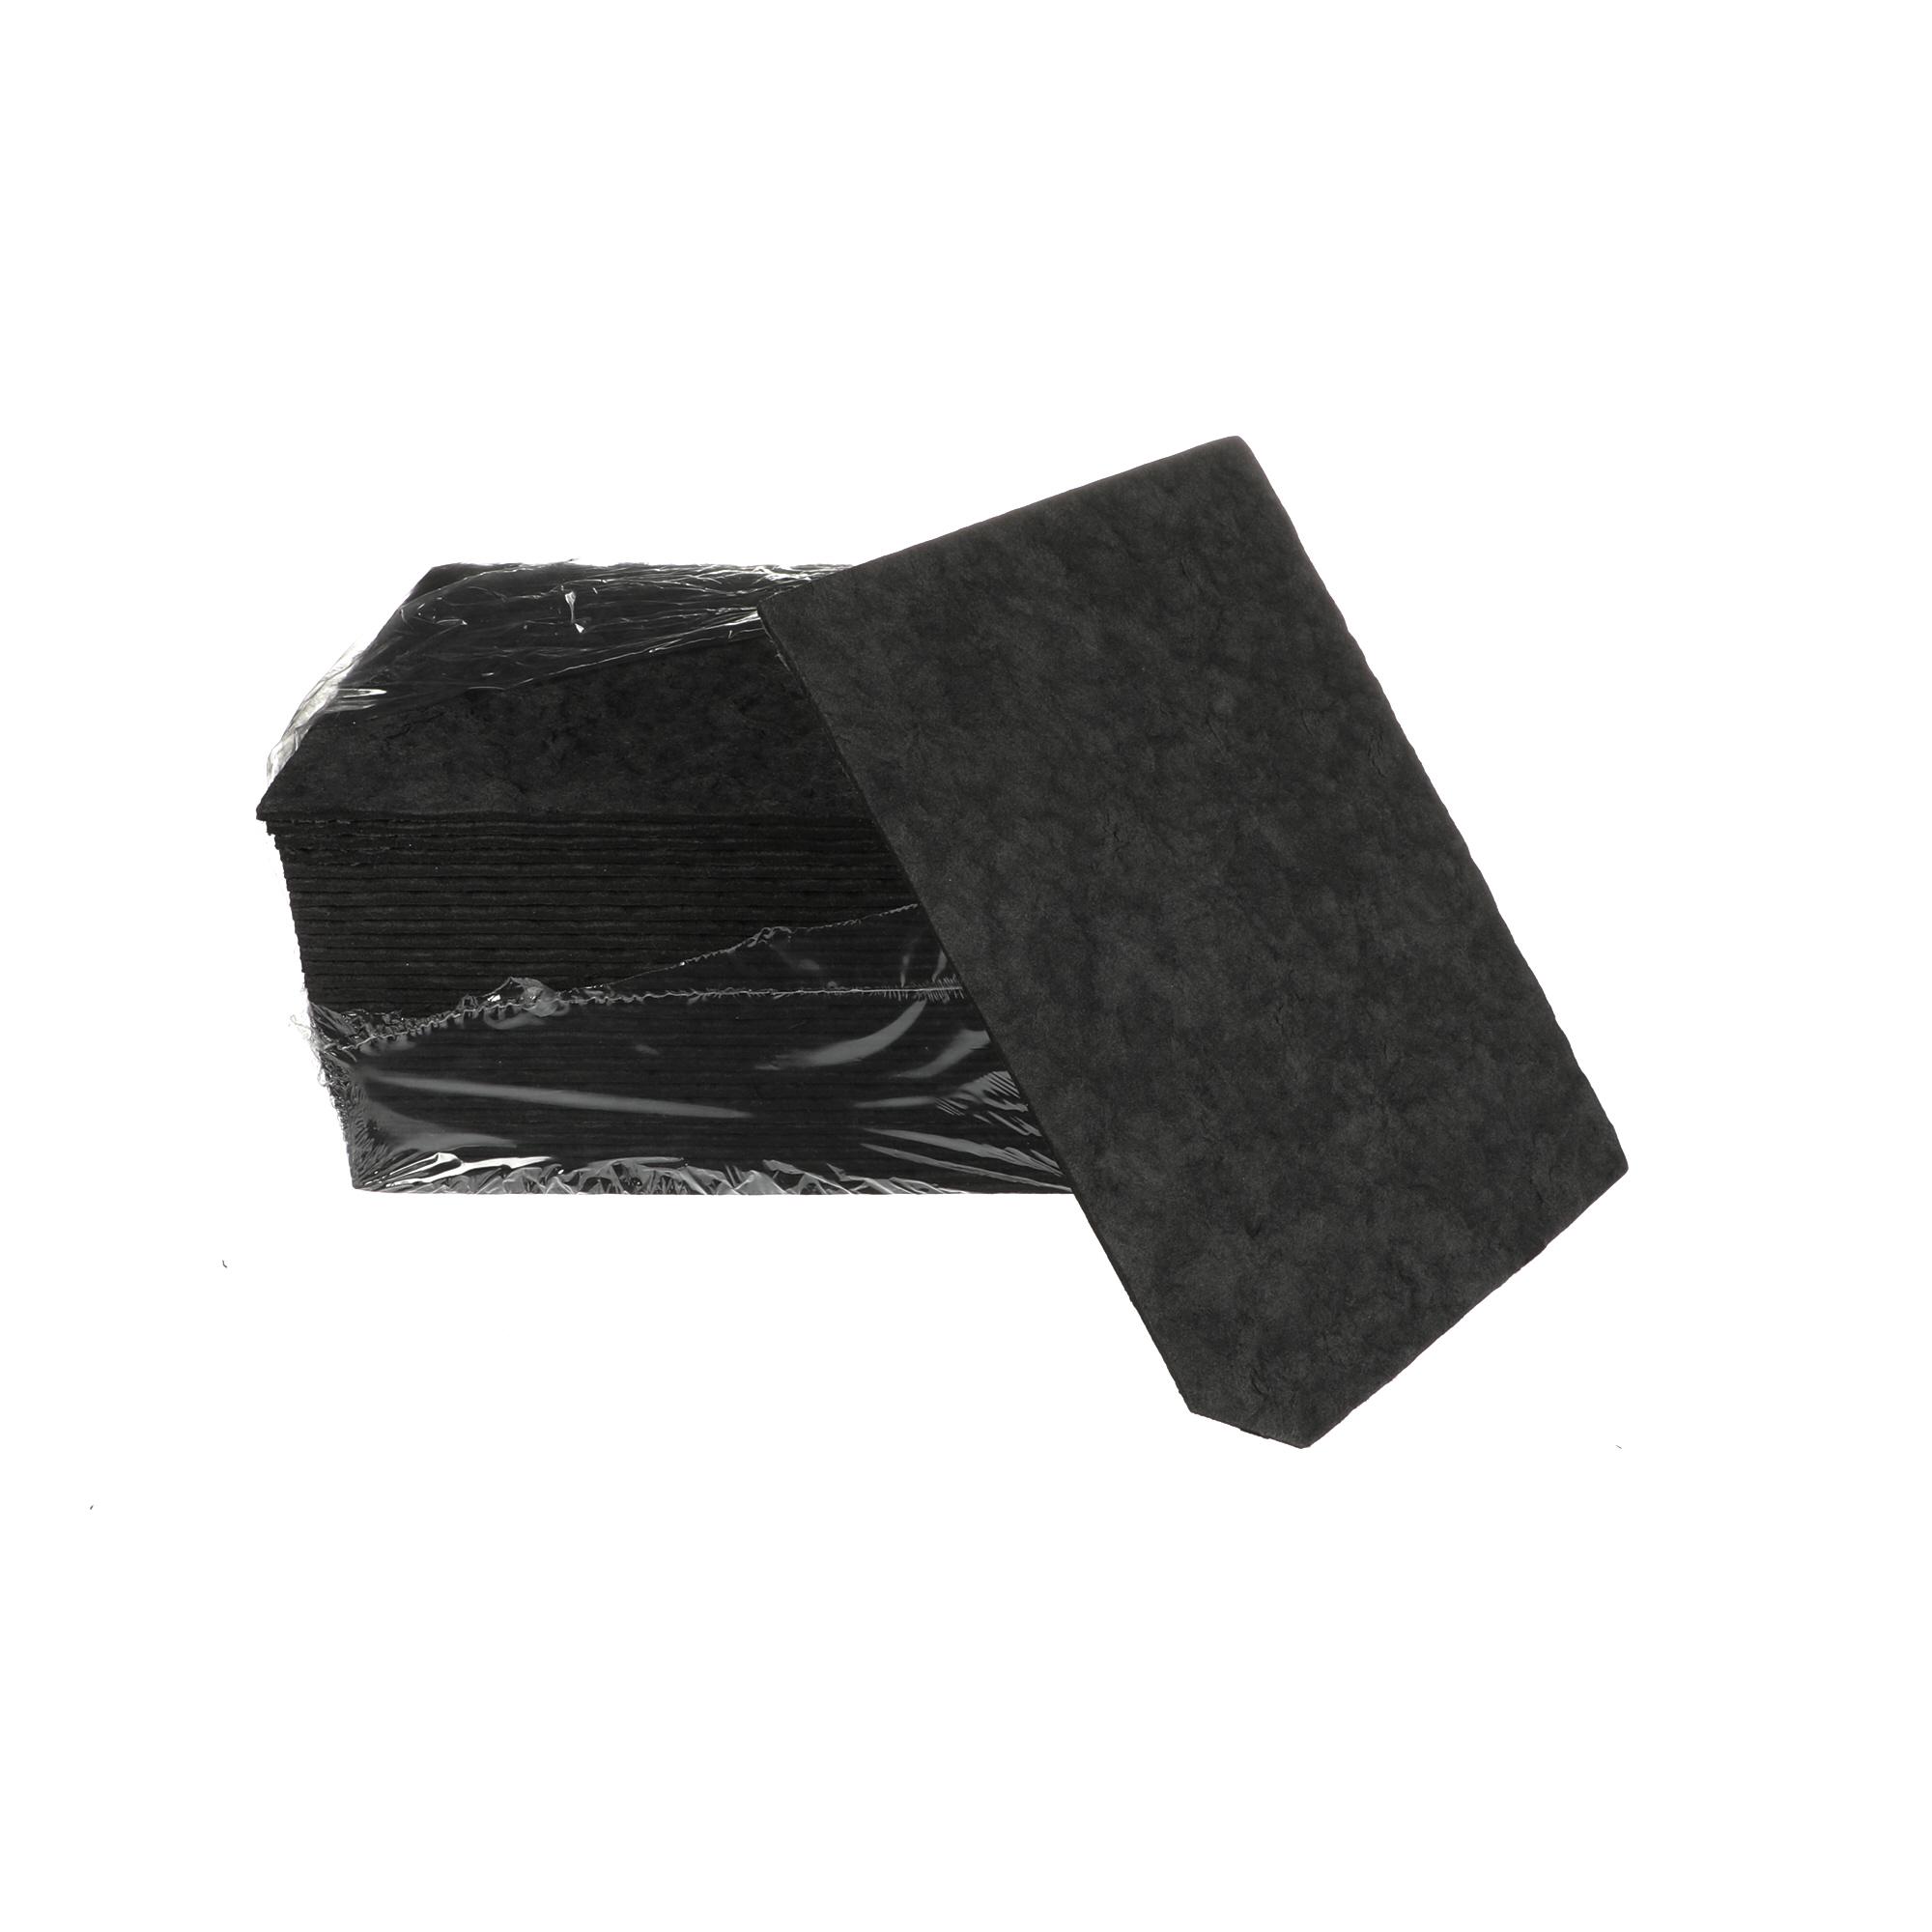 Carbon Filter Pad (Box of 30)